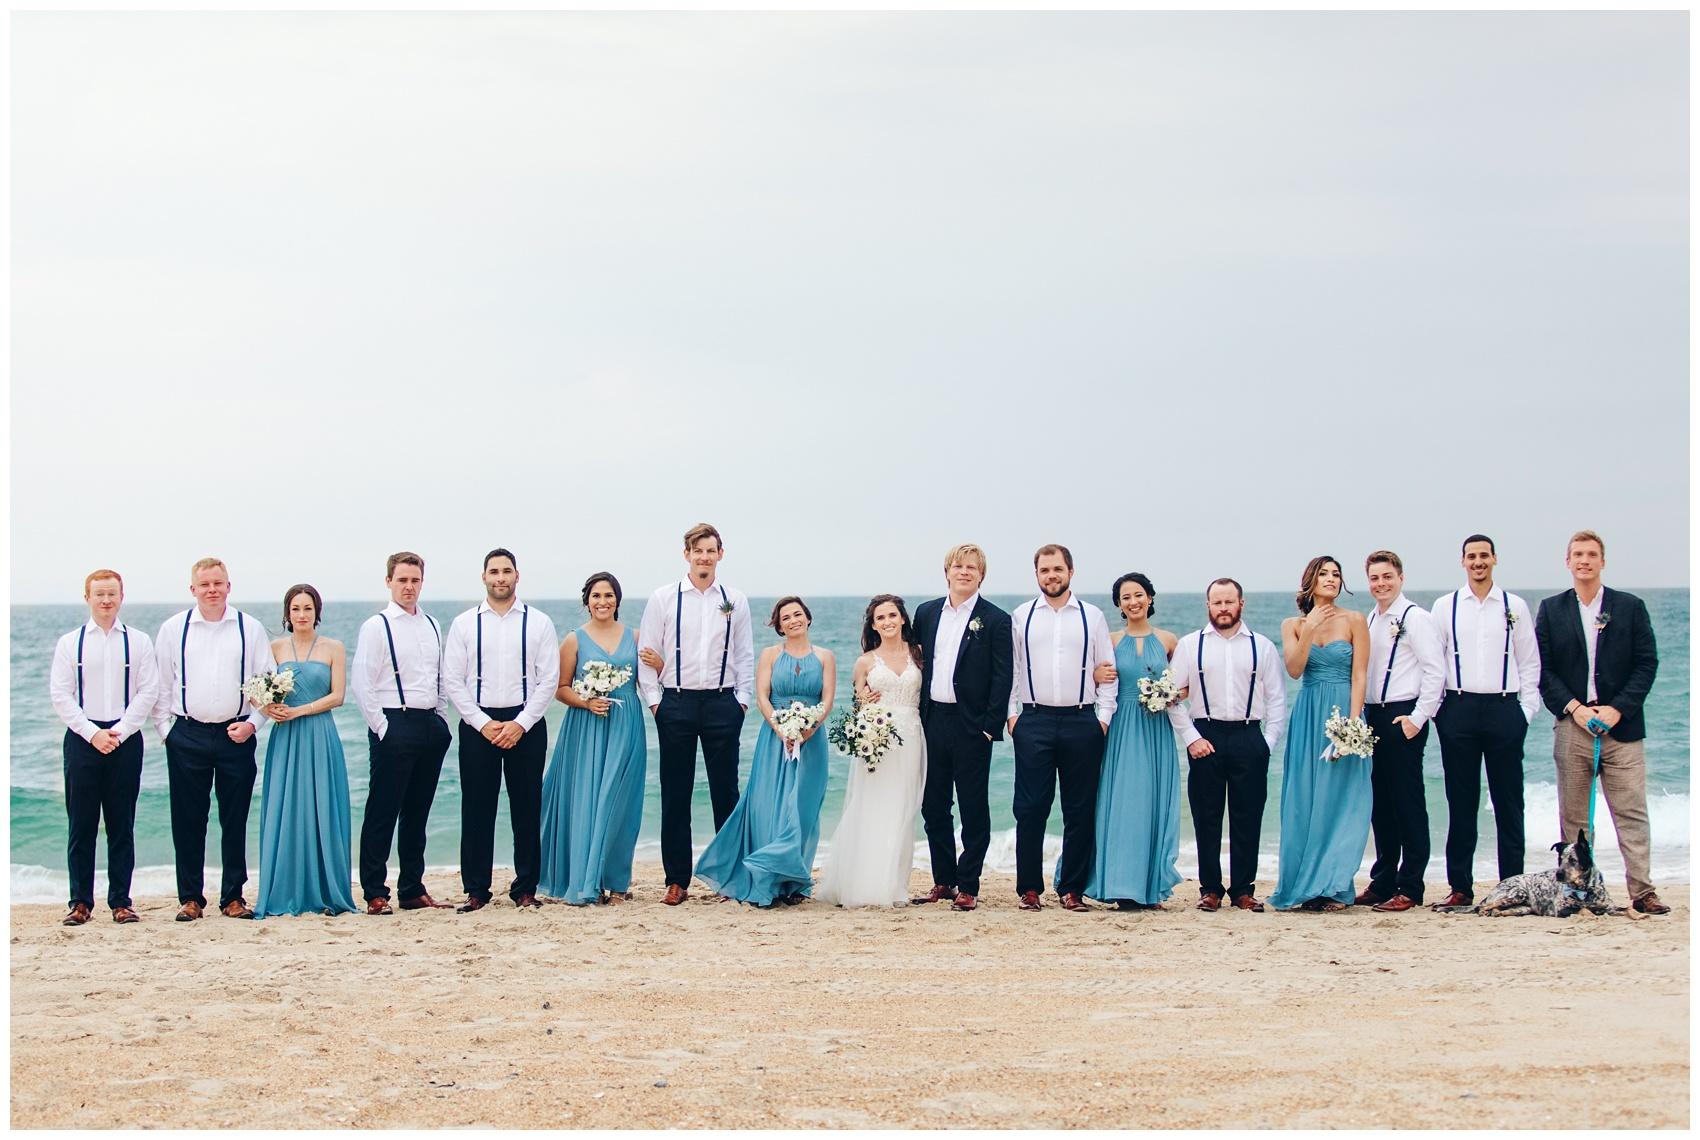 Outer-Banks-Corolla-Wedding_0077.jpg